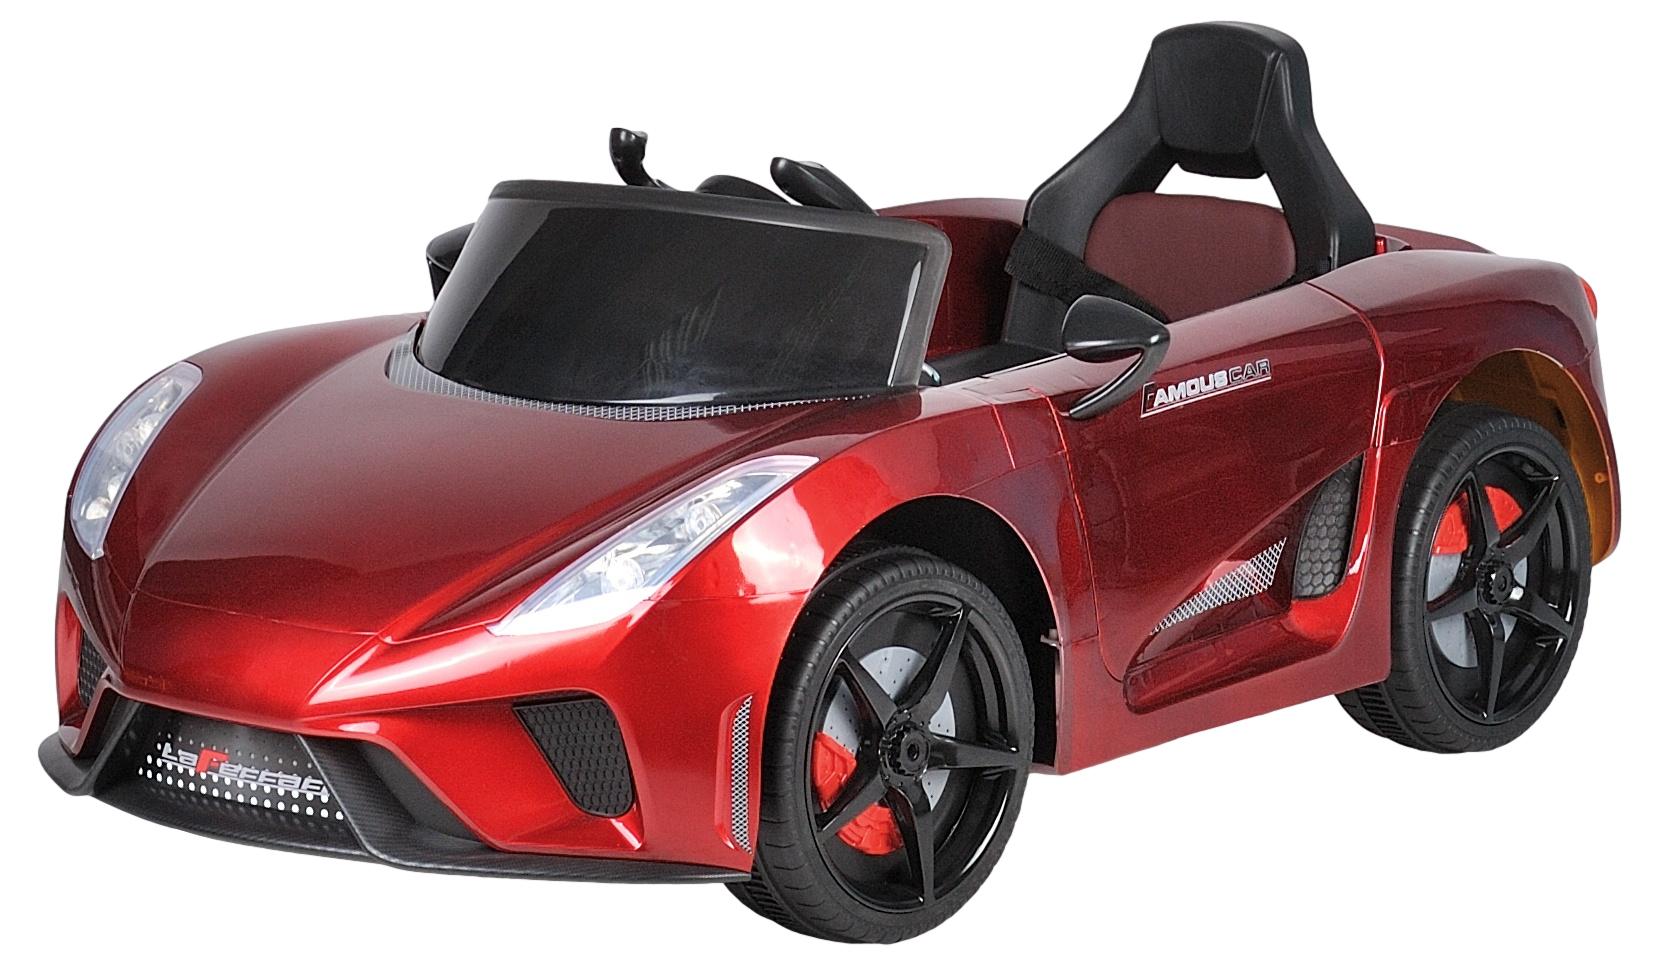 Электромобиль Farfello JJ0102 красный